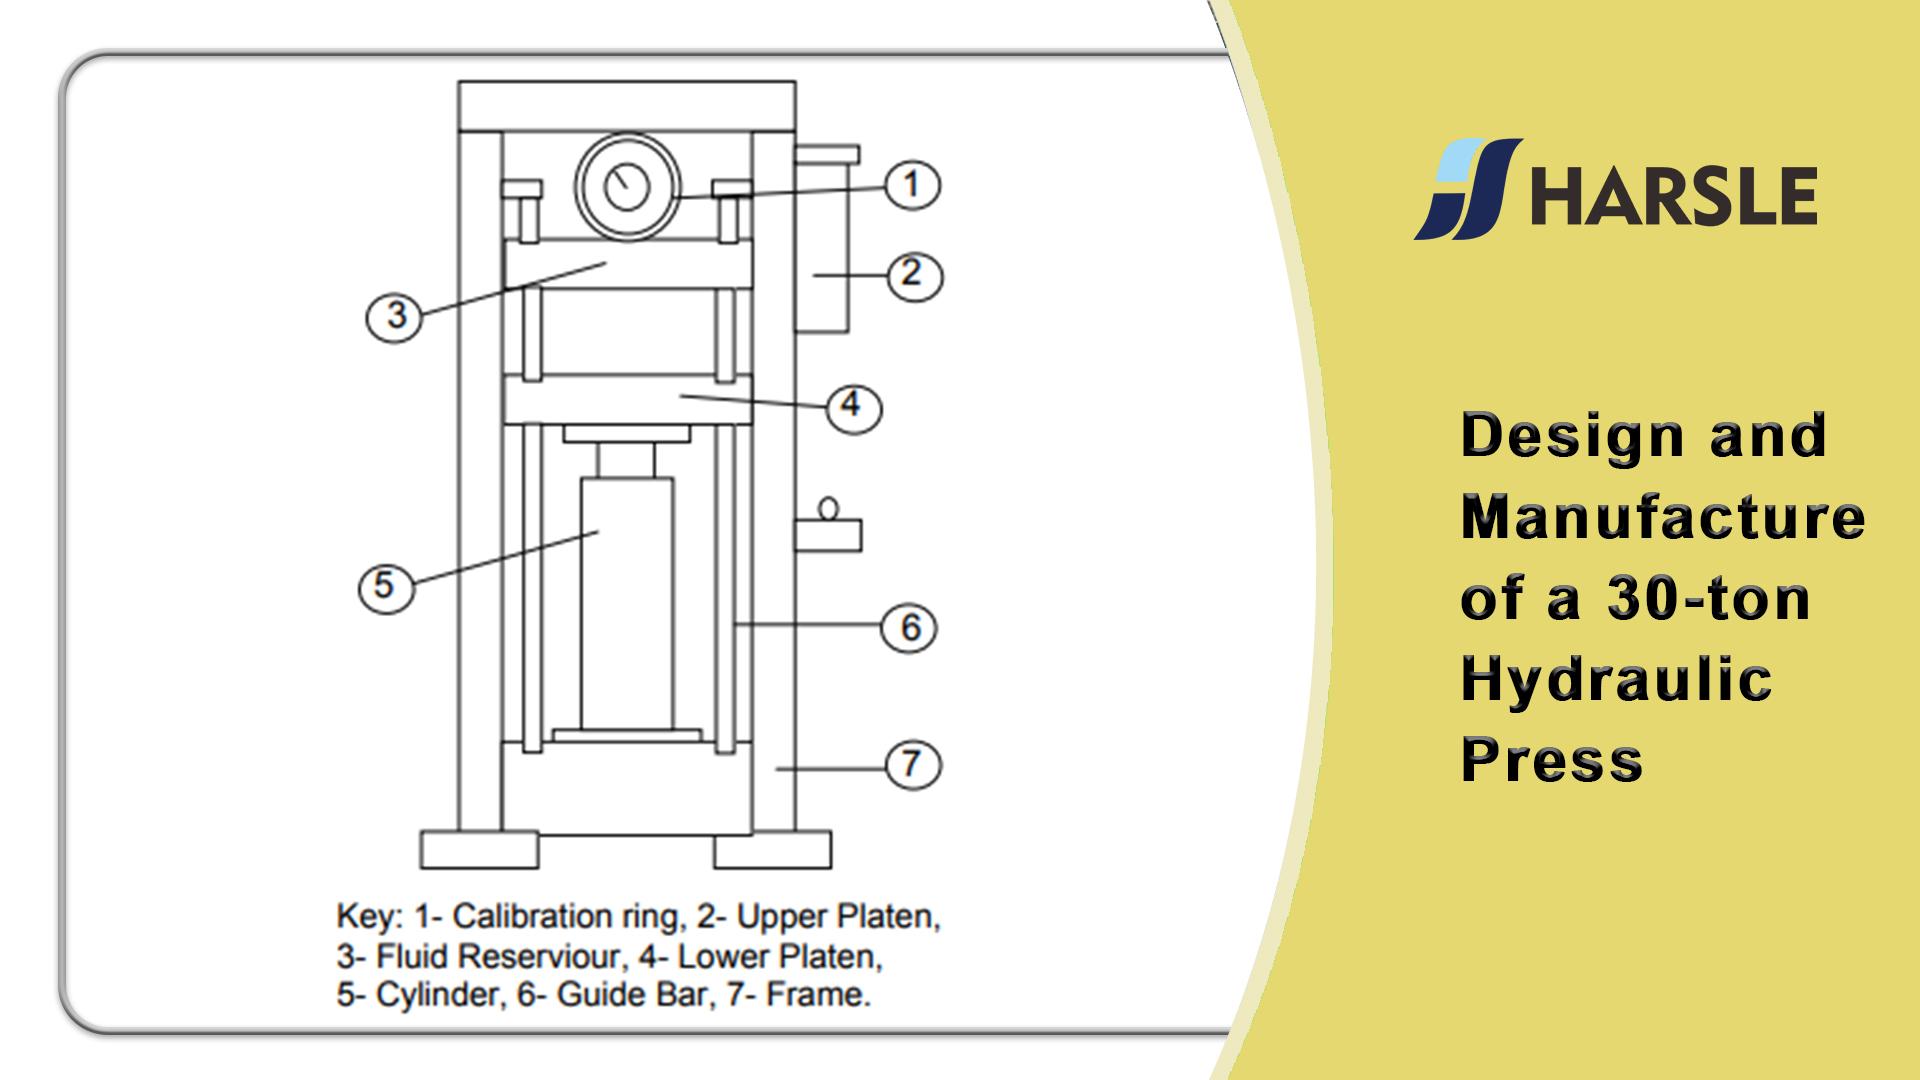 Design and Manufacture of a 30-ton Hydraulic Press - HARSLE MACHINE | Hydraulic Press Schematic |  | HARSLE MACHINE